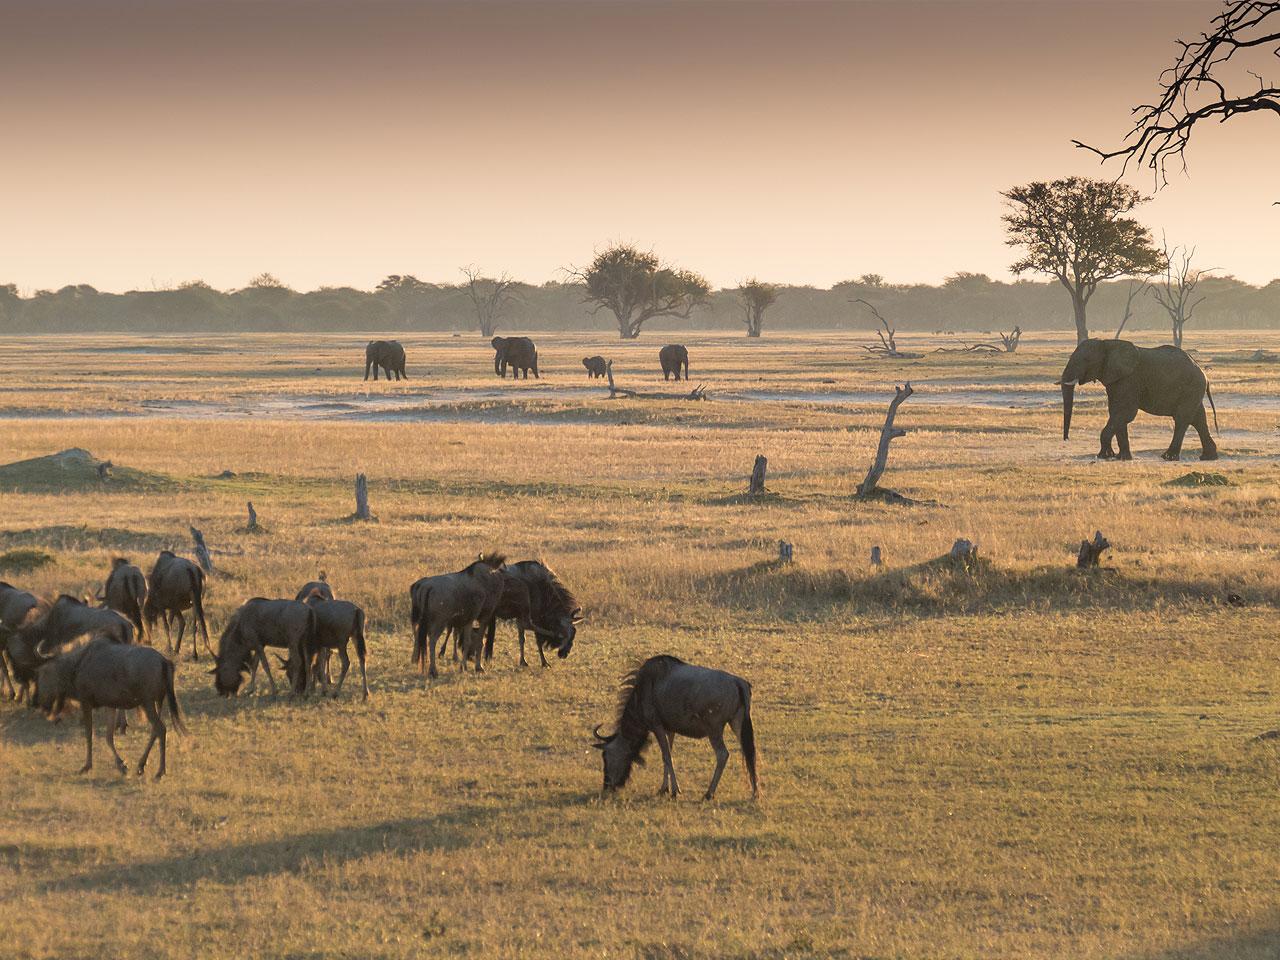 Elephants walking across a grass plain with widebeest grazing.